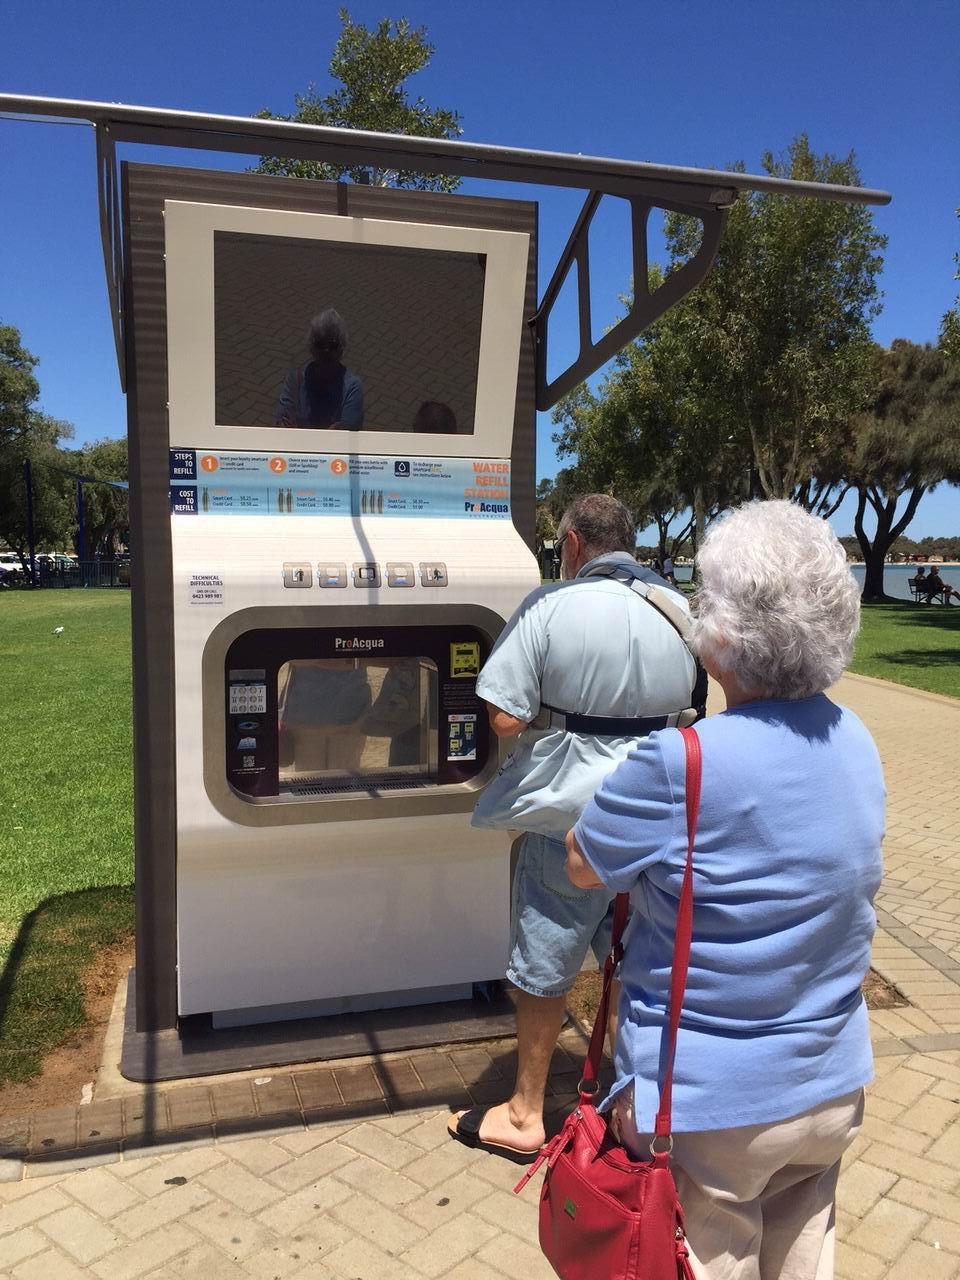 New water dispenser popular